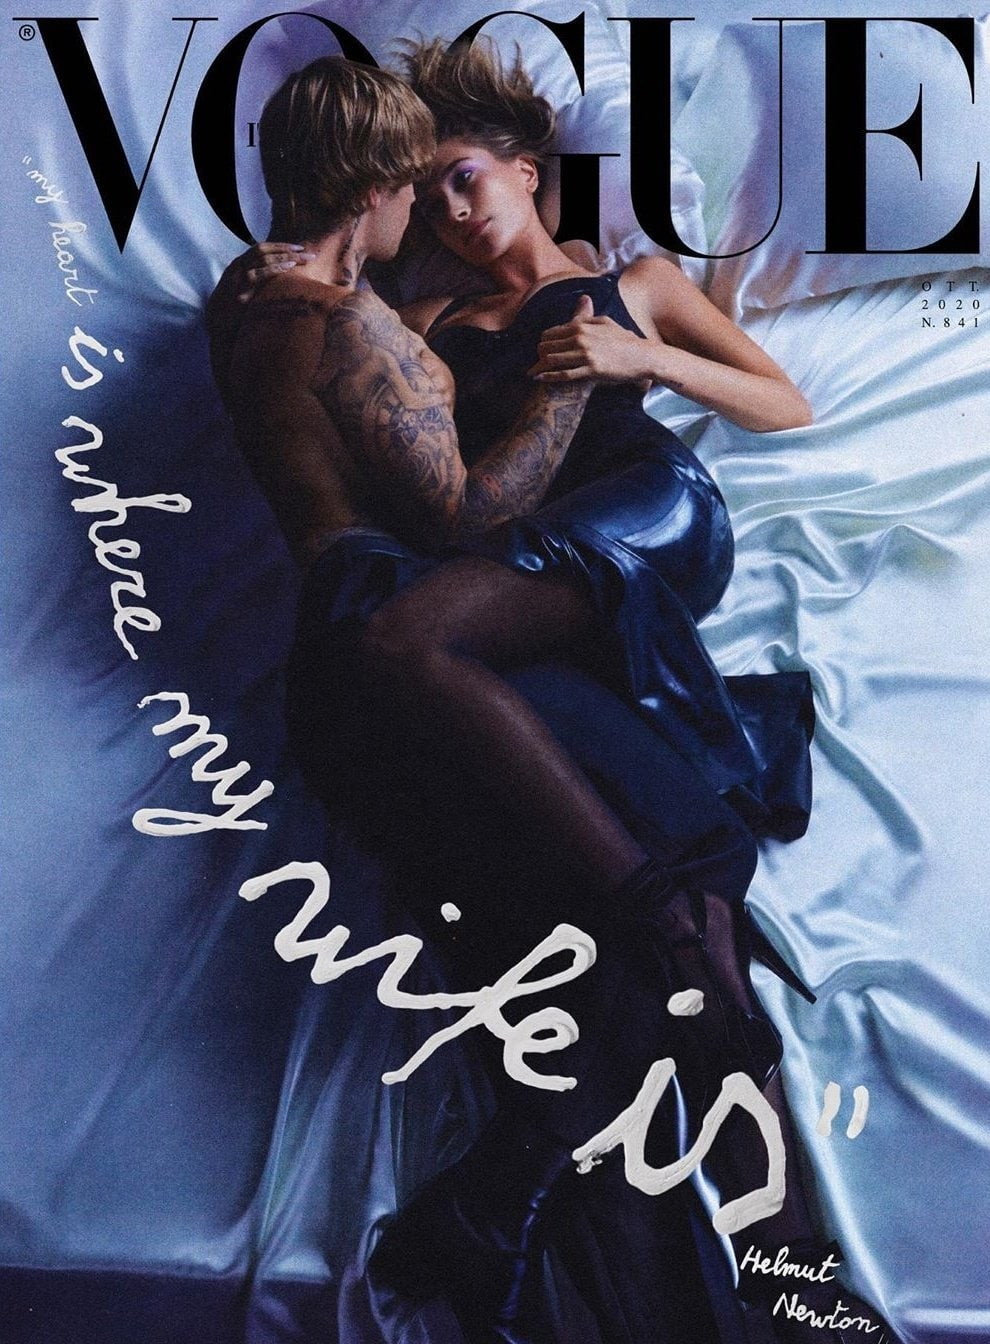 Justin Bieber Hailey vogue 1 - Фото: Джастин Бибер и его жена на обложке Vogue